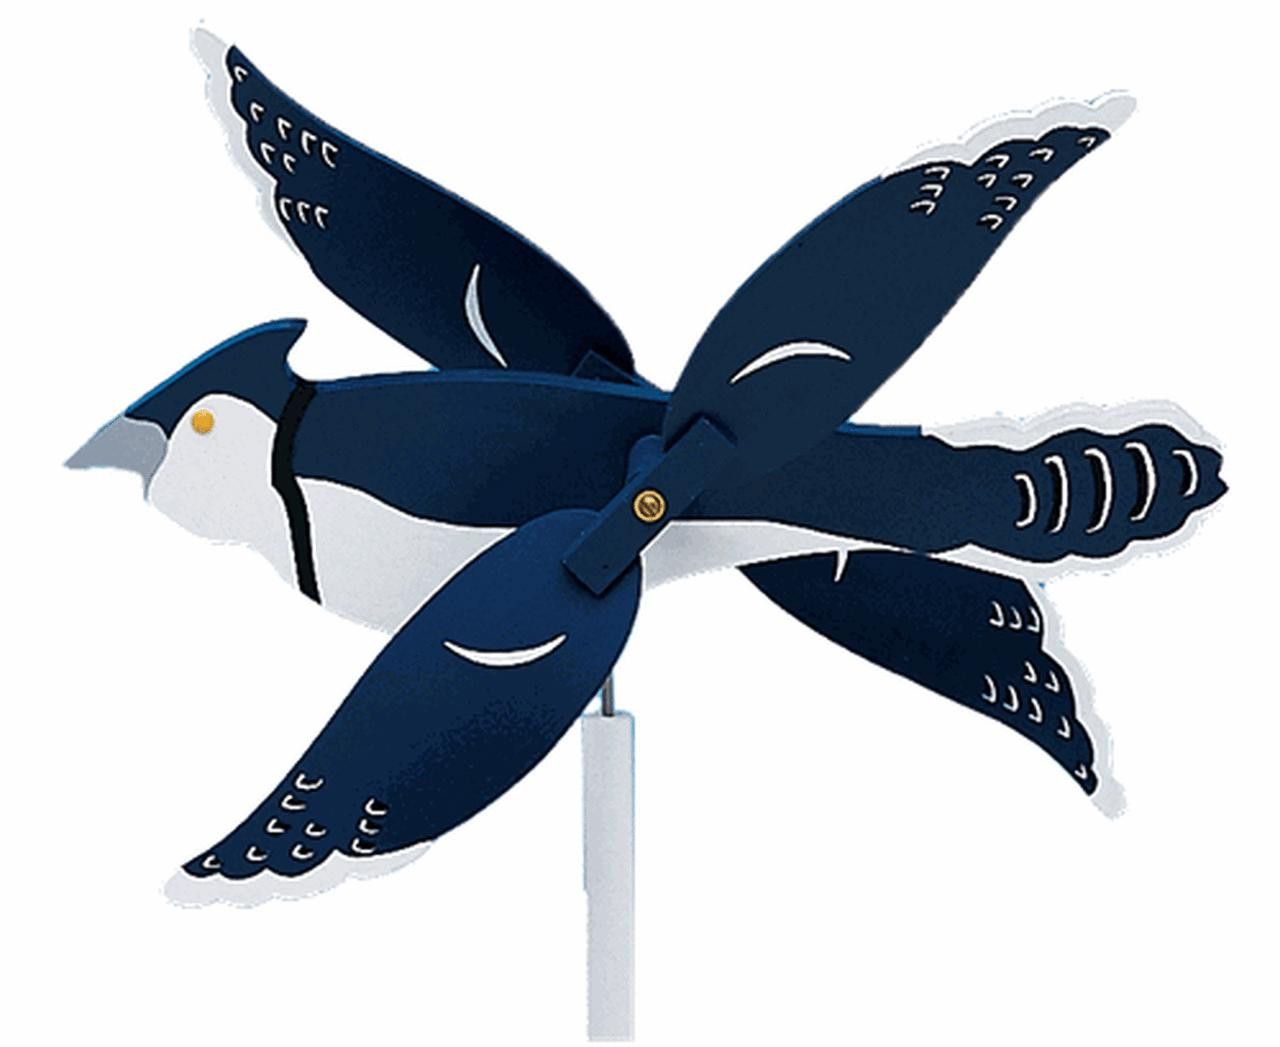 Cherry Tree Toys Blue Jay Whirligig DIY Kit